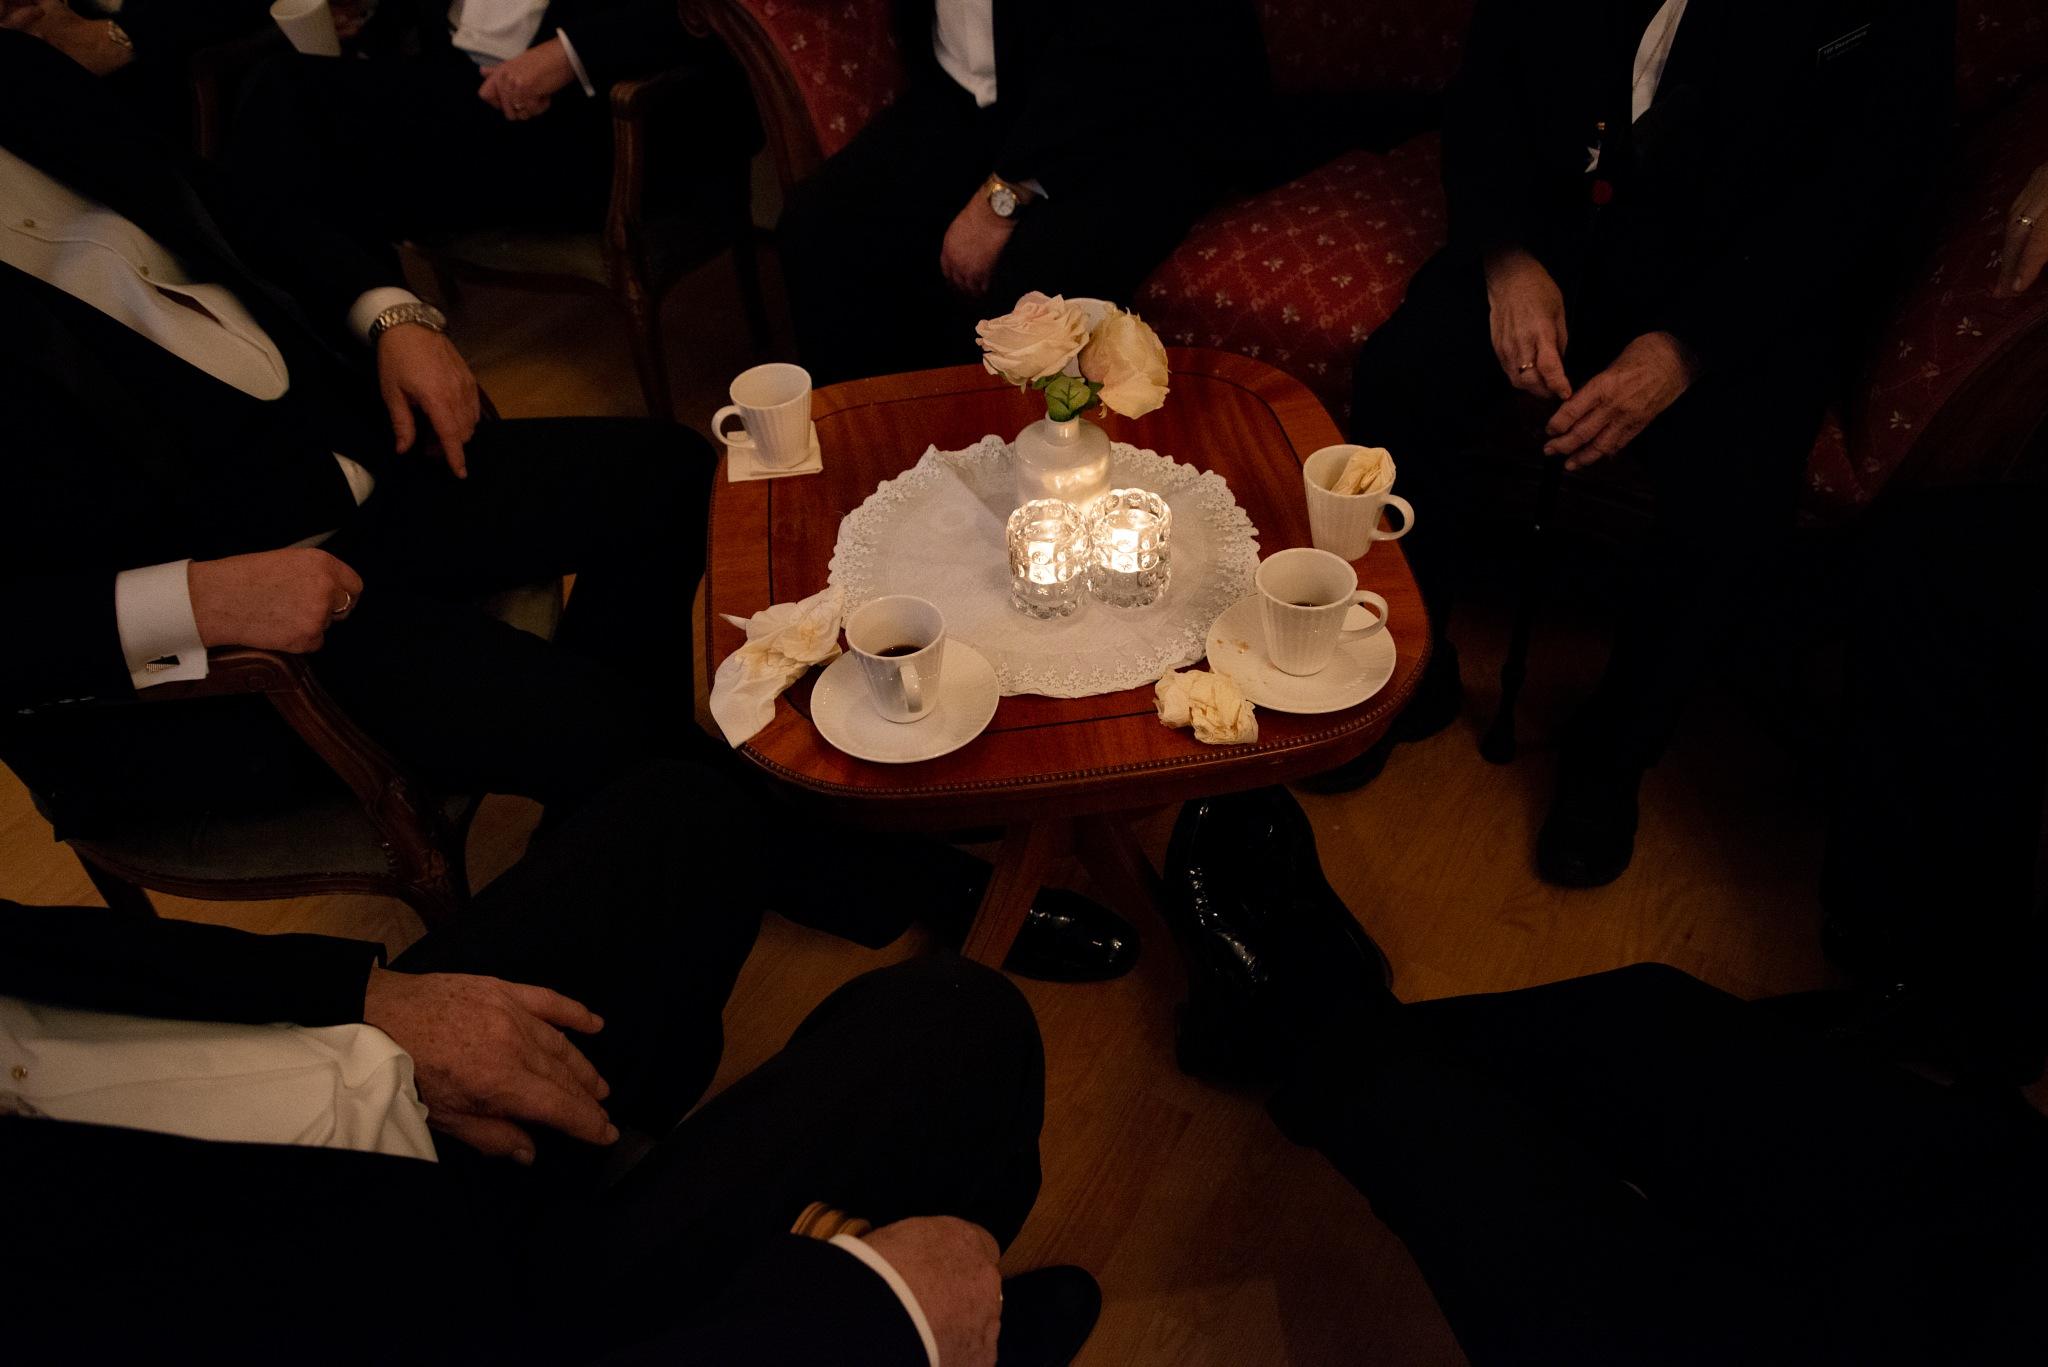 Men in Black around the table by Goran Jorganovich